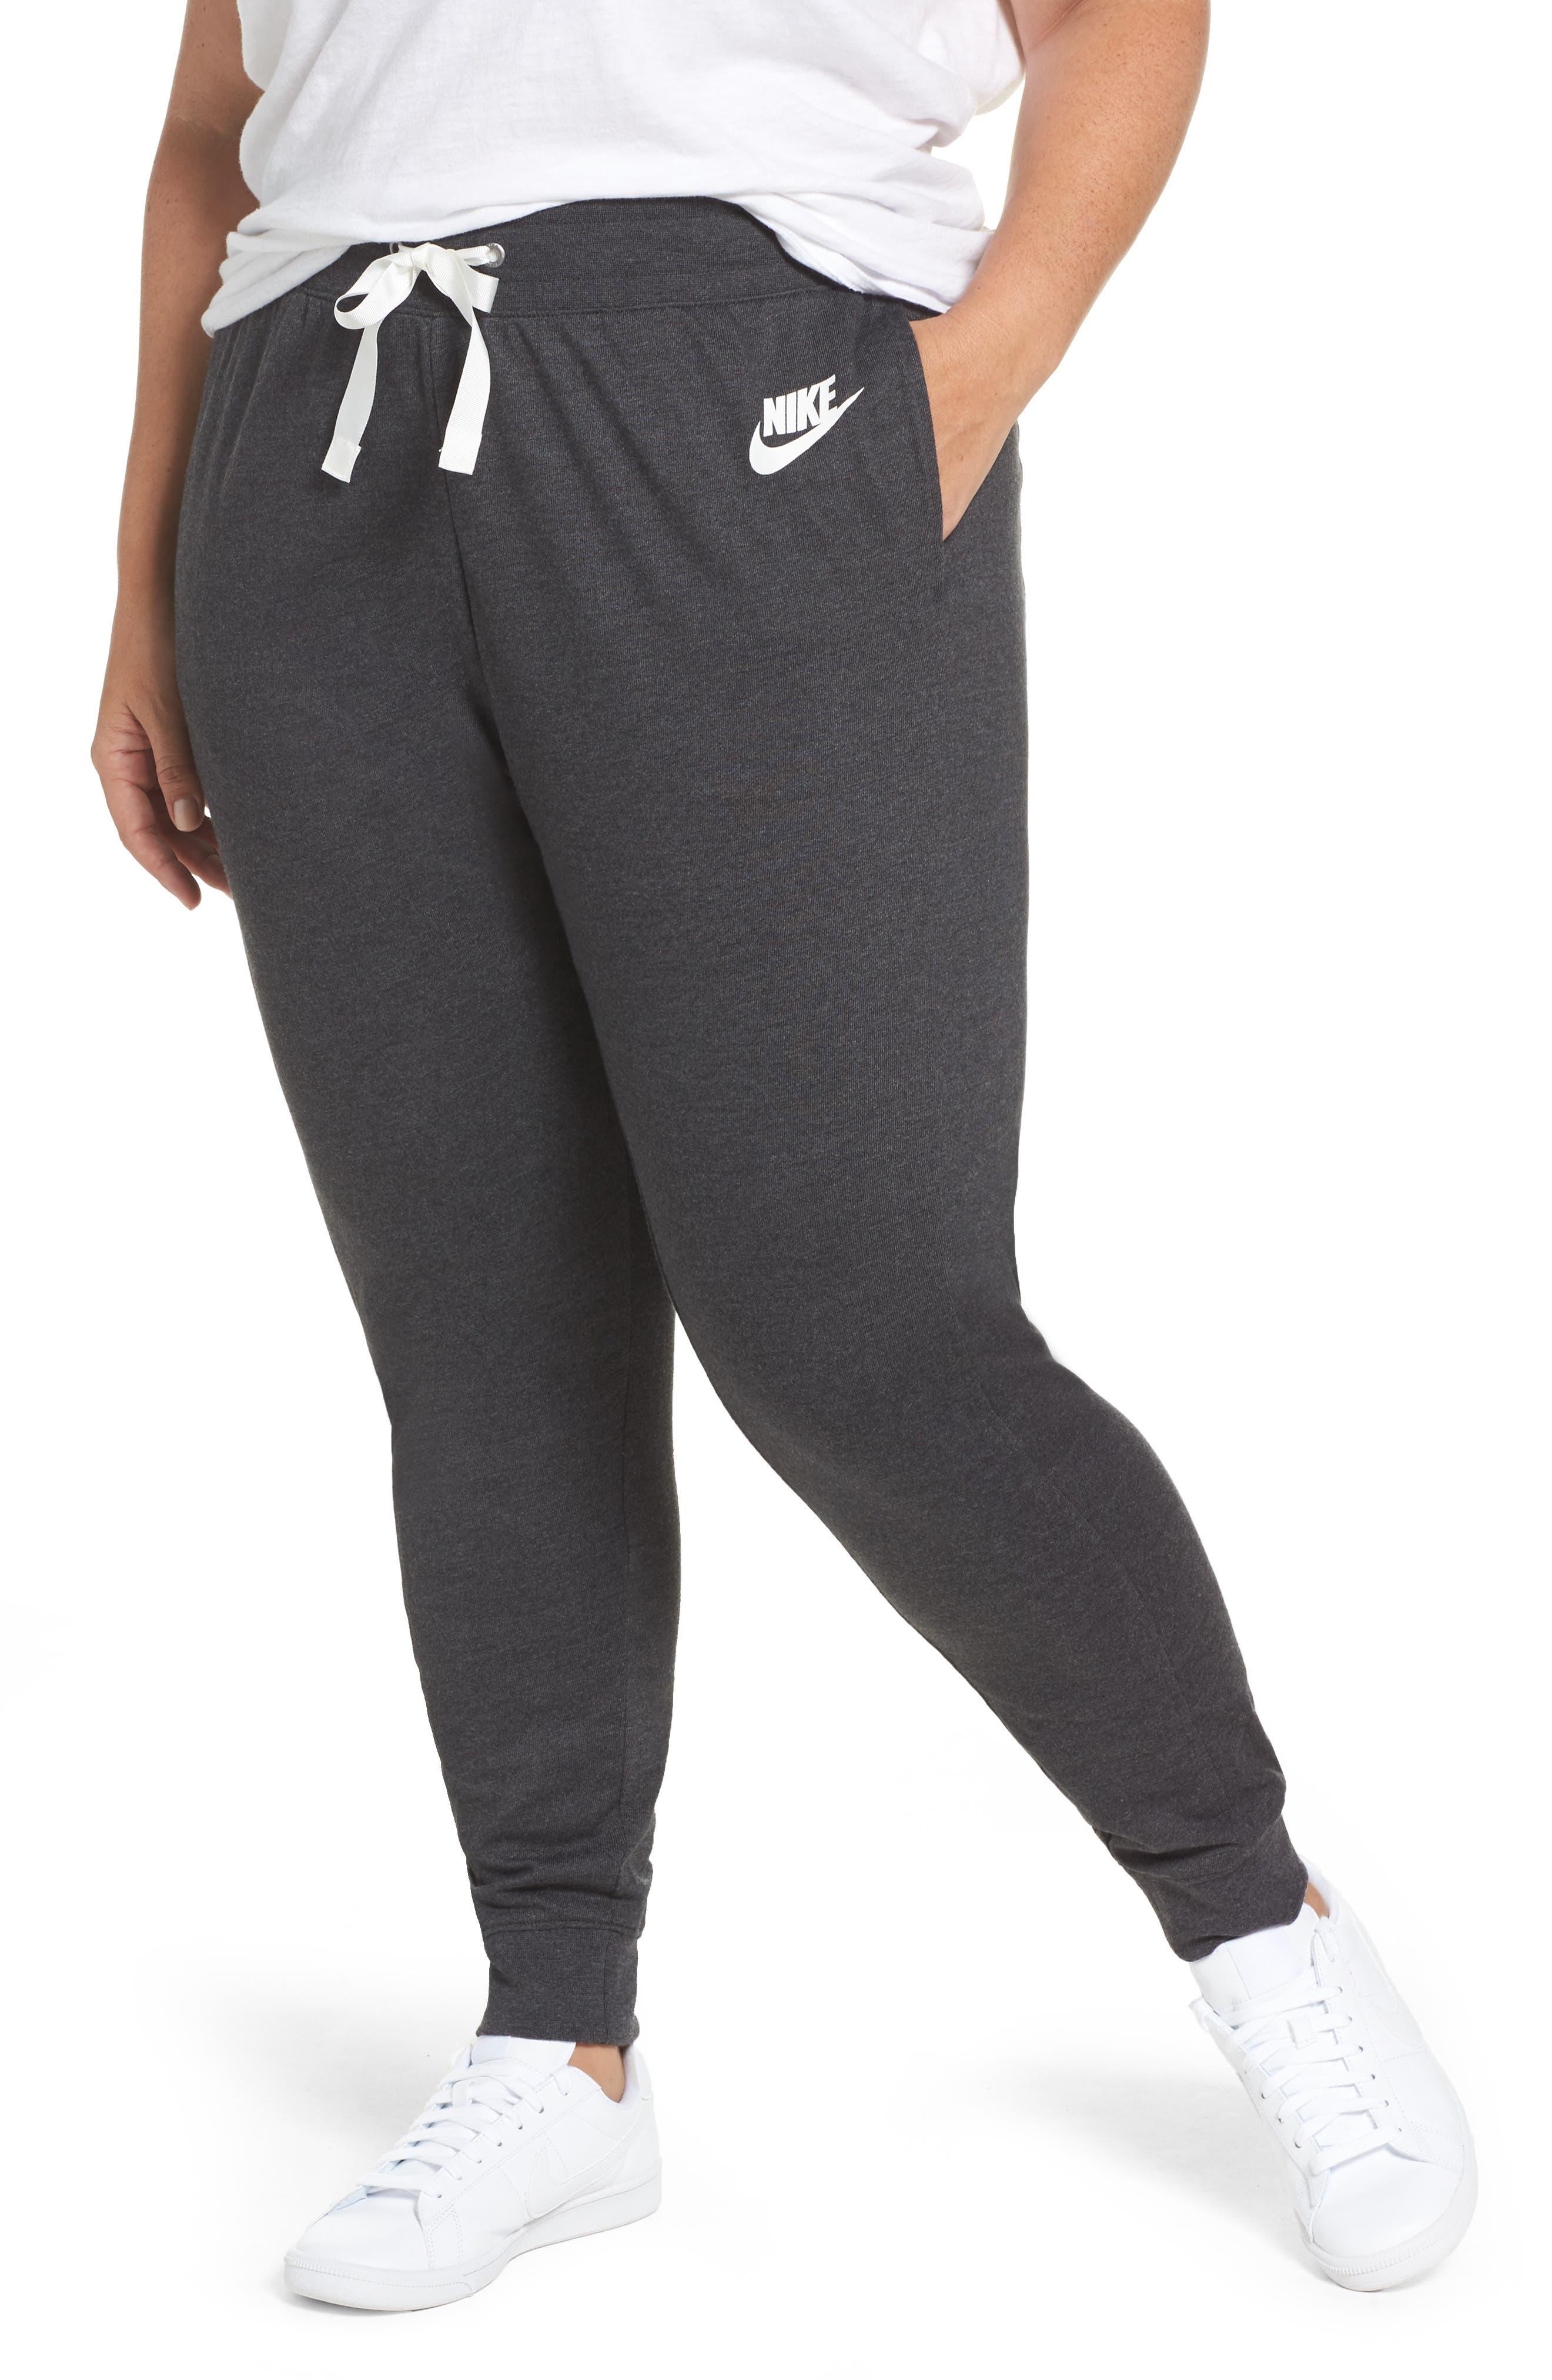 Nike Sportswear Gym Classic Pants (Plus Size)